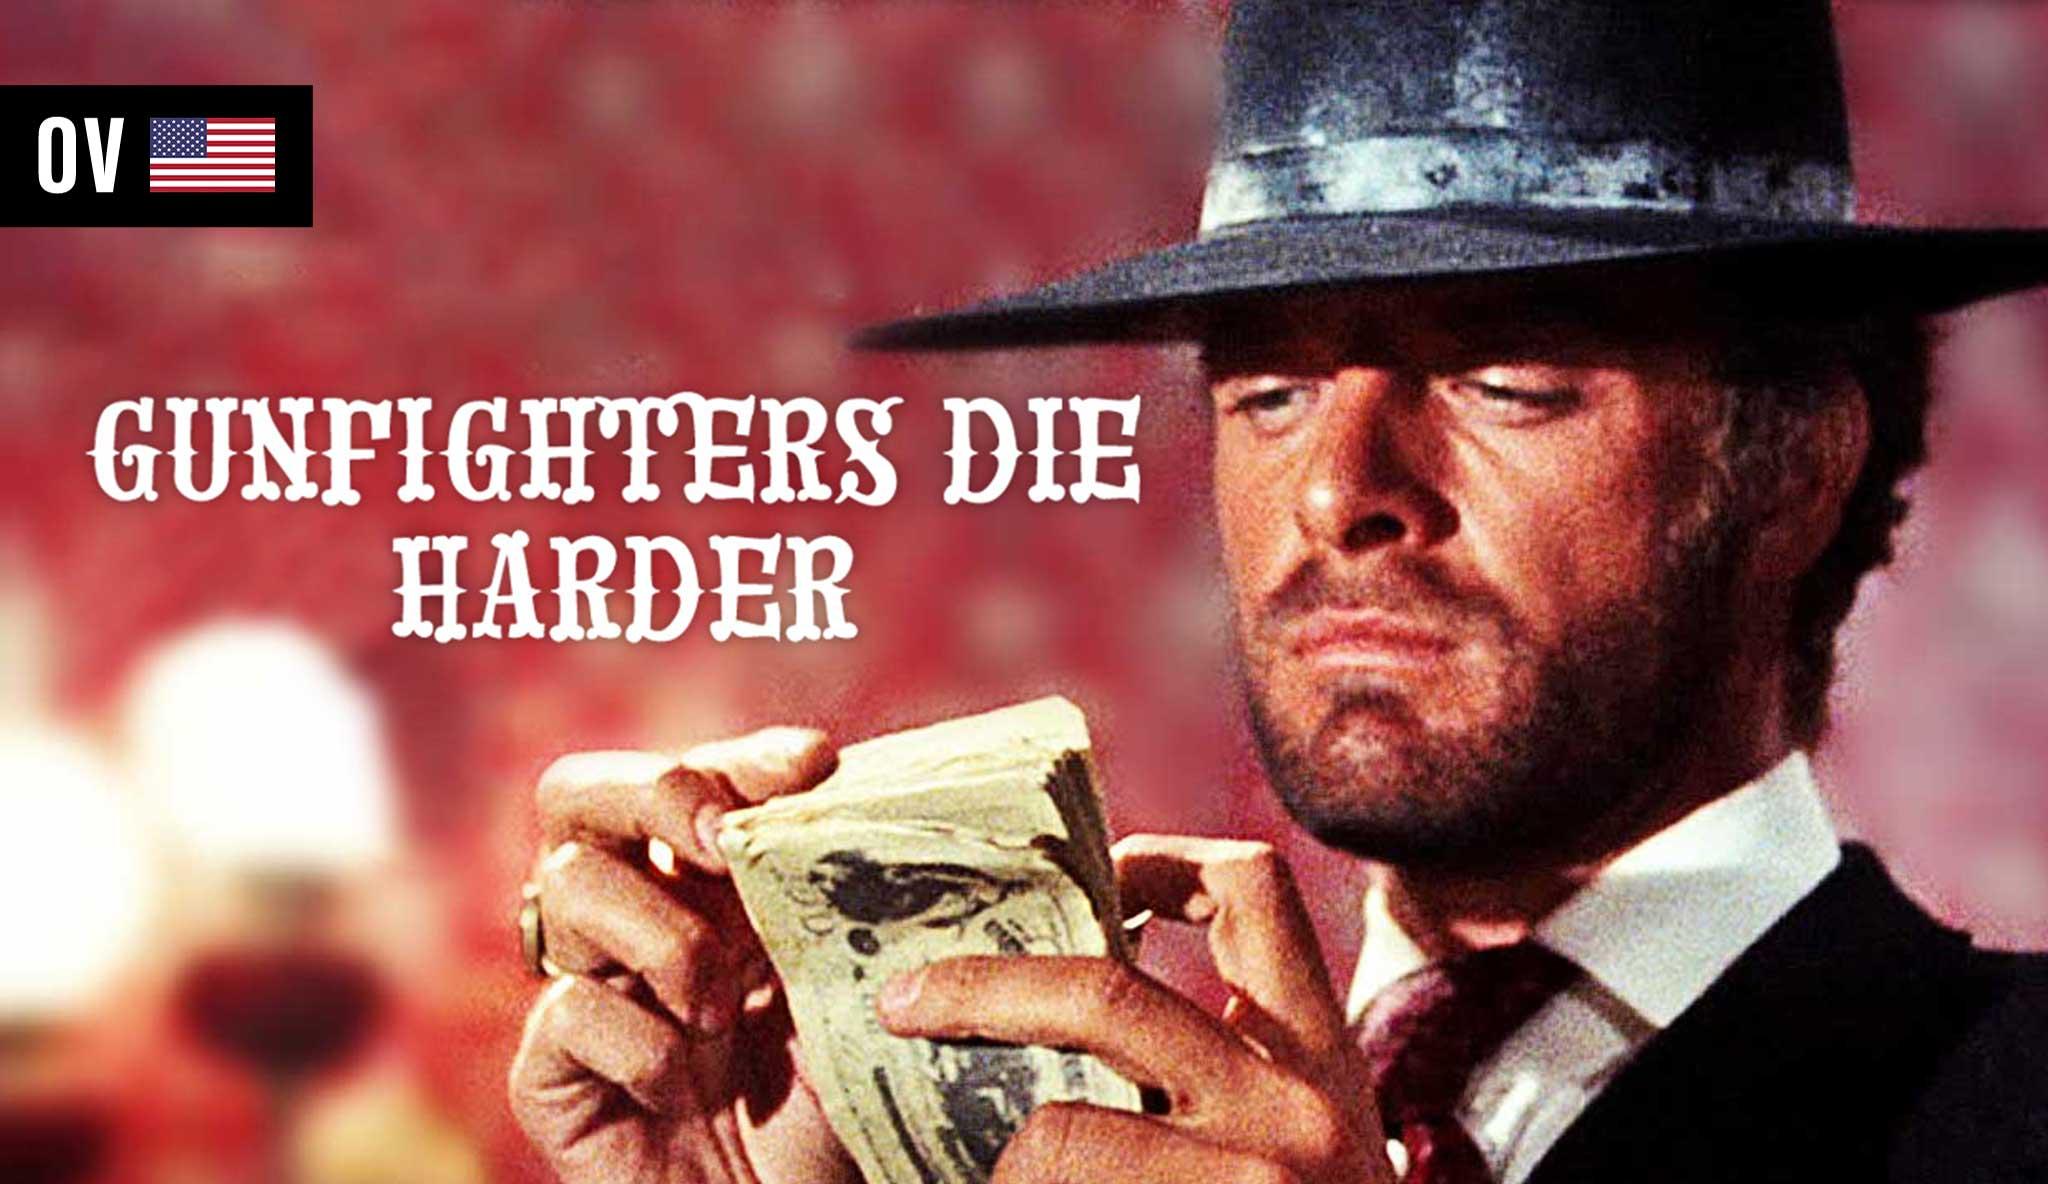 gunfighters-die-harder\header.jpg